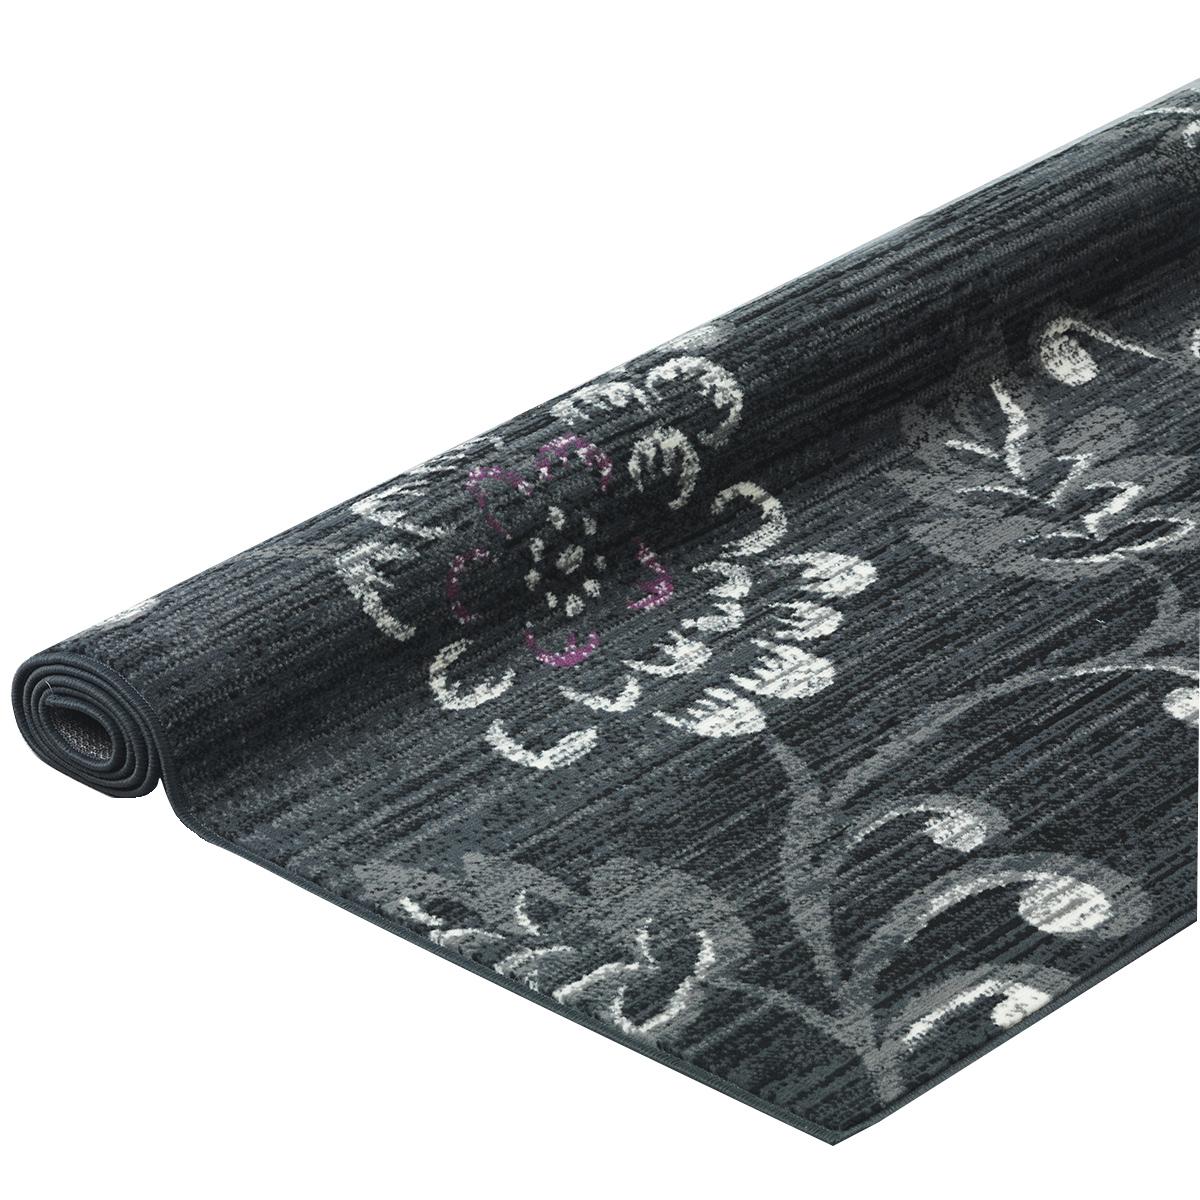 килим Lanu орнаменти т.сиво лила